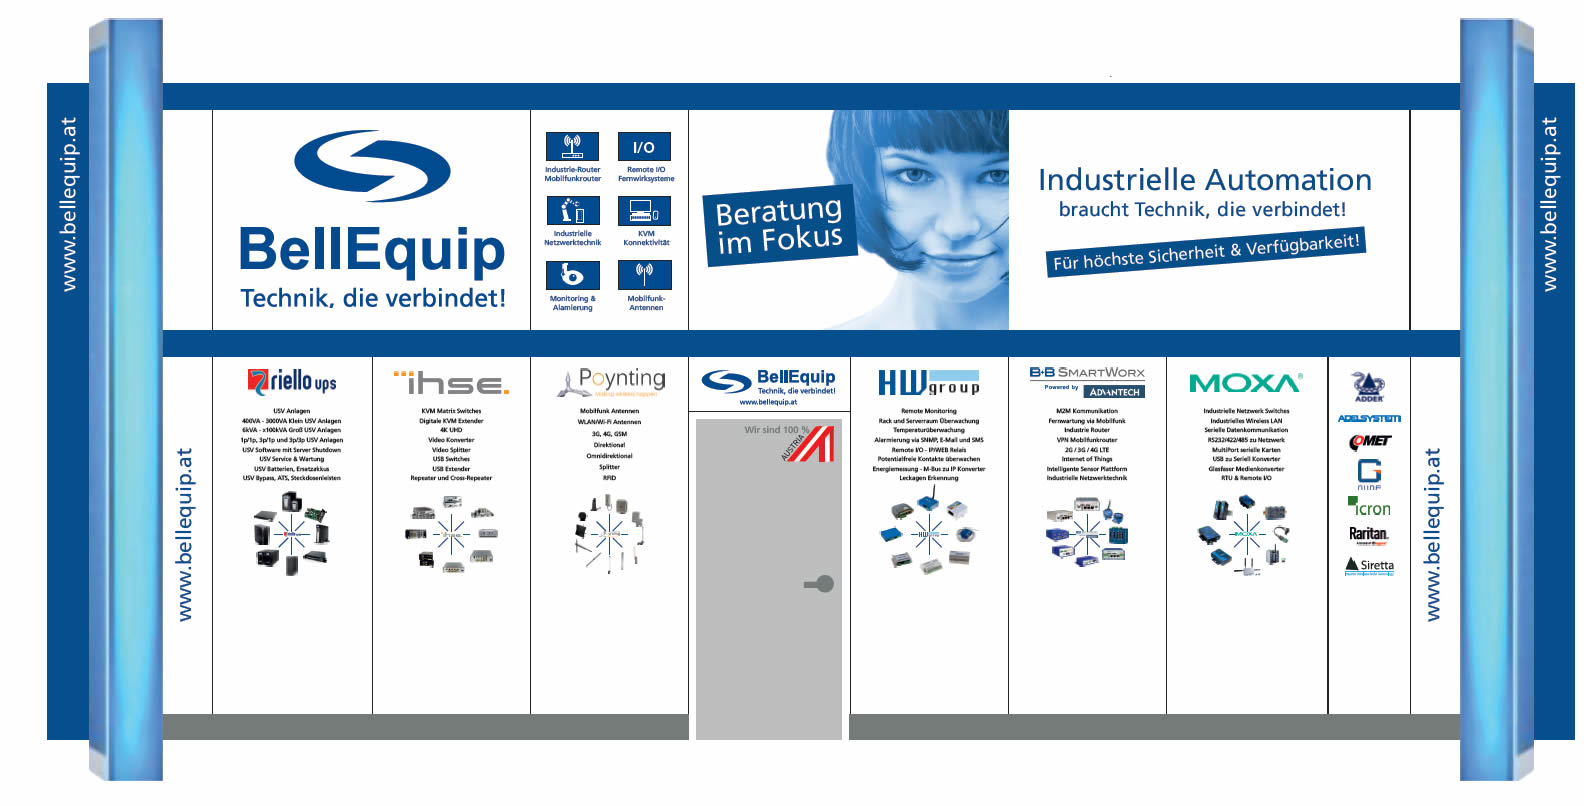 bellequip-messestand-smart-automation-2017